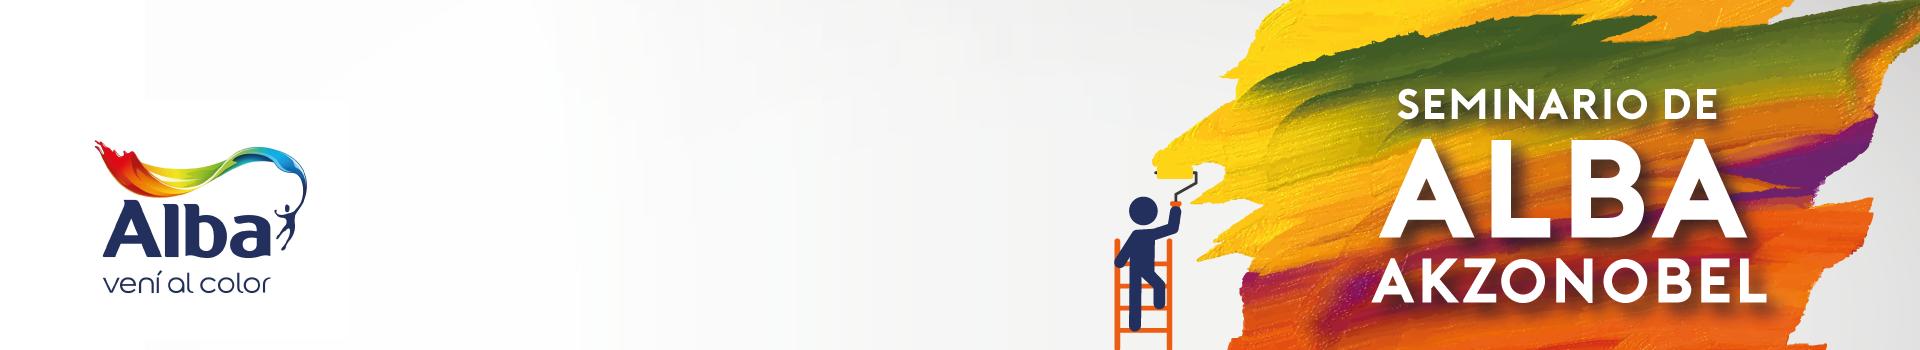 trineo-portada-web